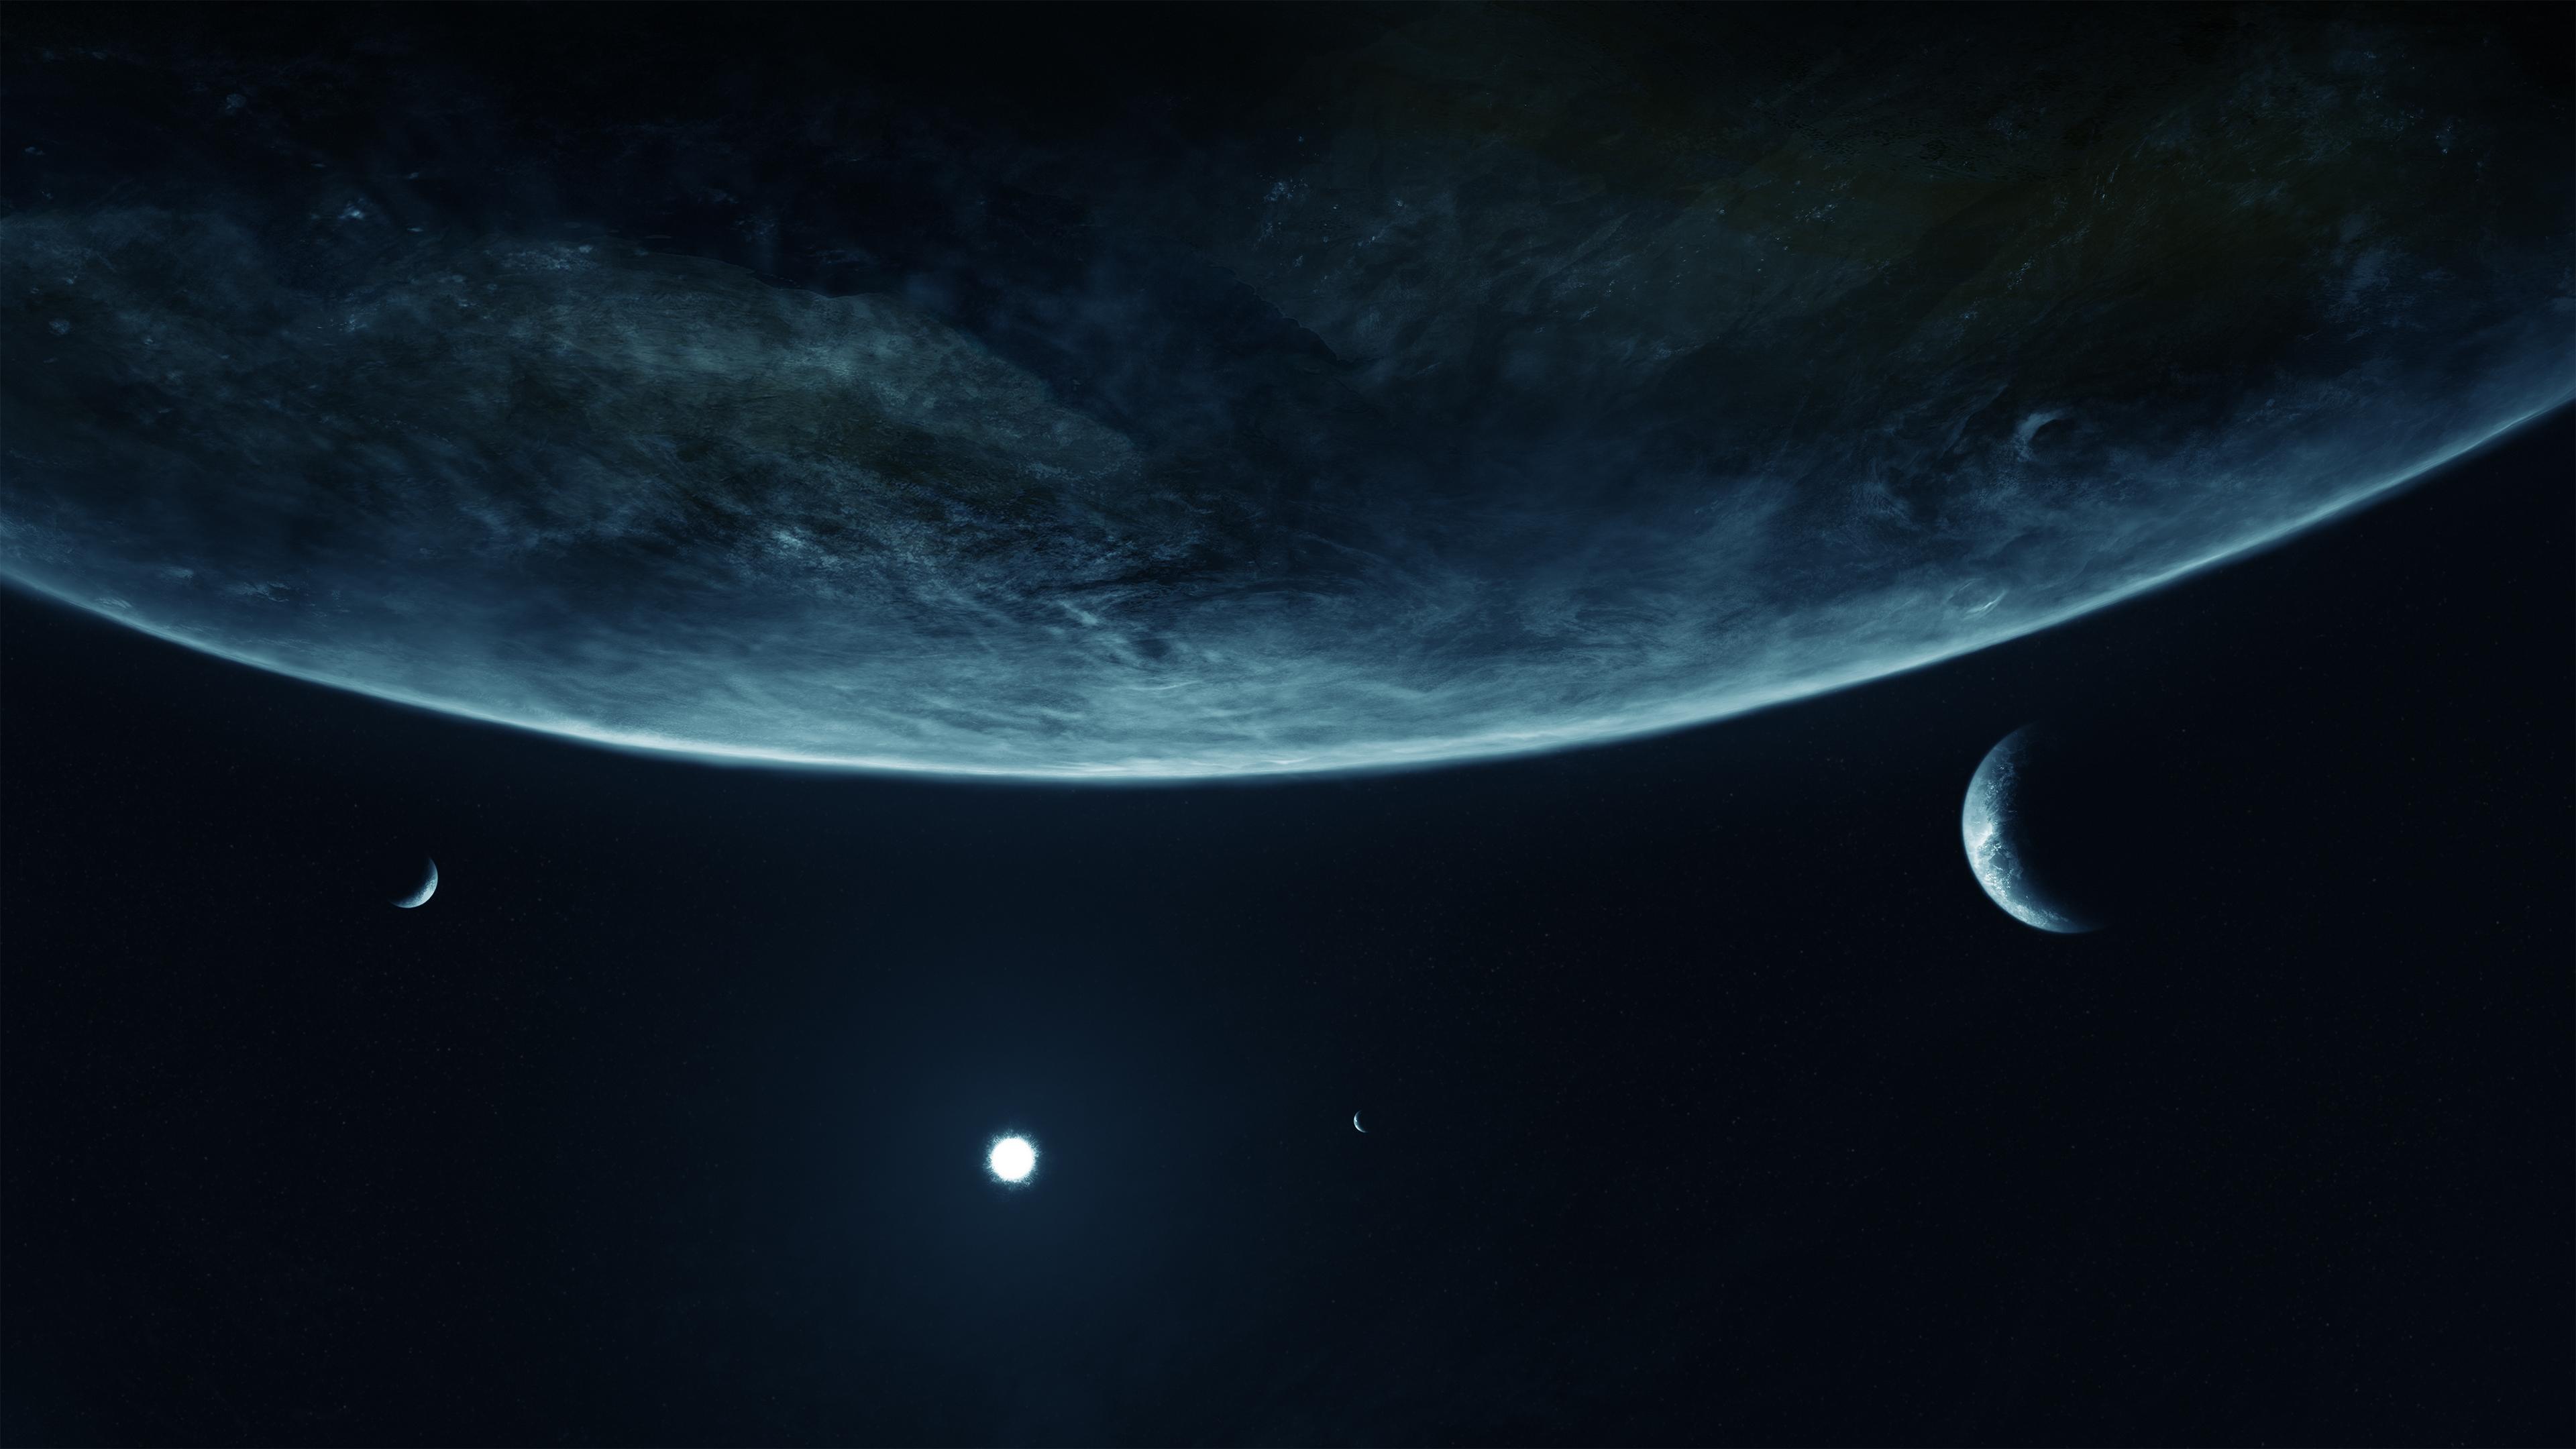 Planets Star wallpaper 3840x2160 177884 WallpaperUP 3840x2160